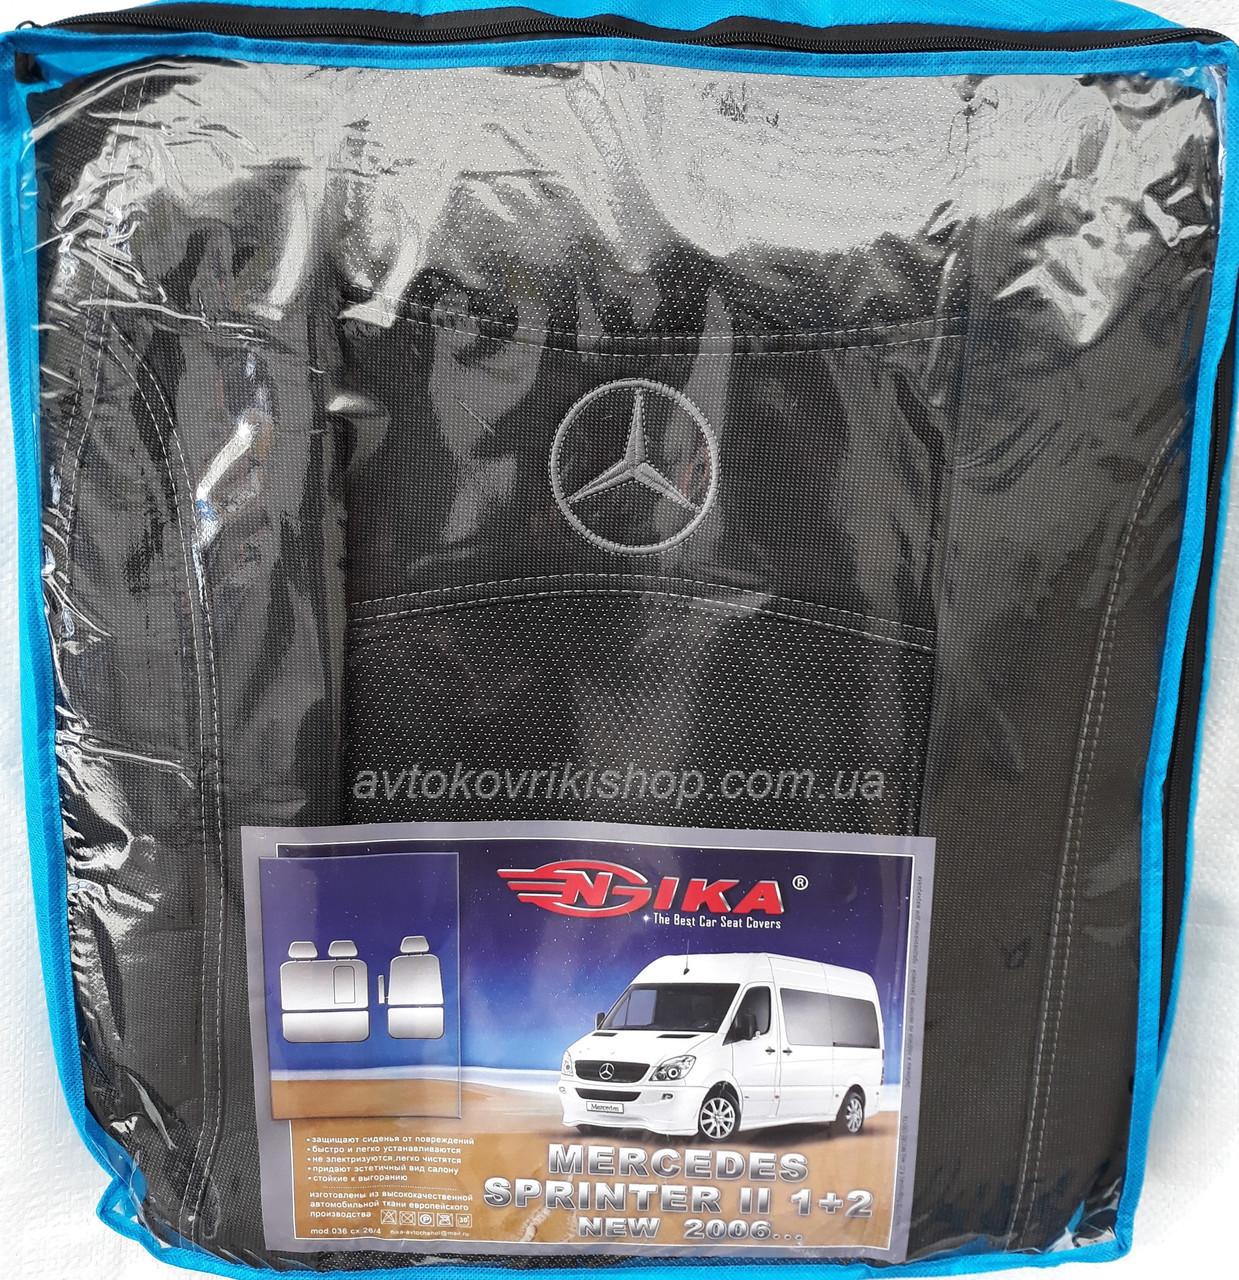 Авточохли Mercedes Sprinter II 1+2 2006- Nika